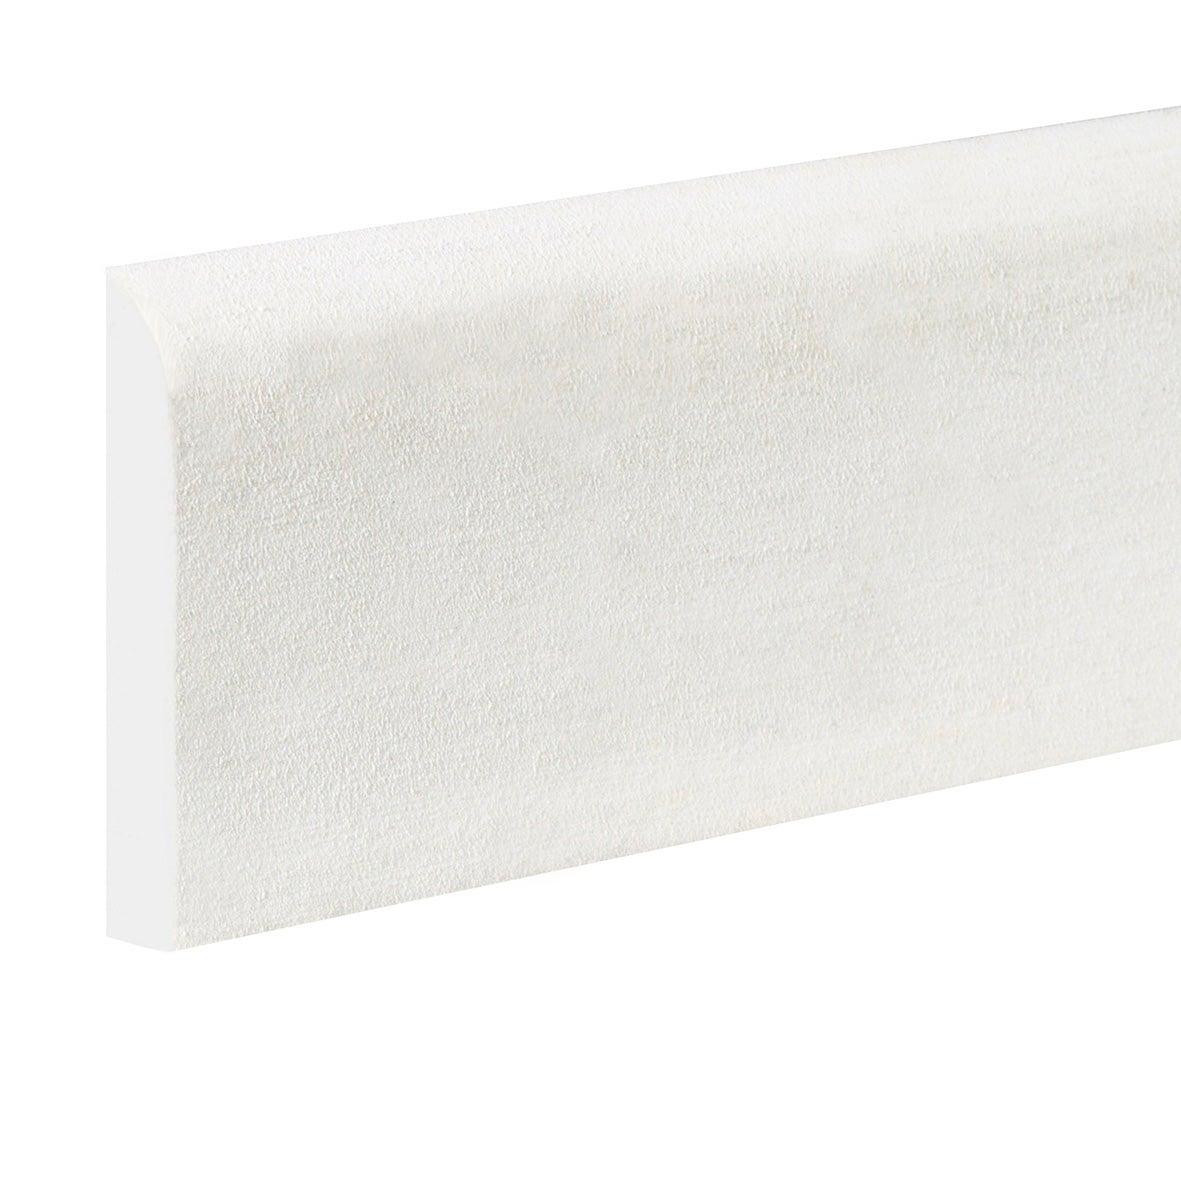 Plinthe Flexible En Pvc Blanc 10x69mm L 2 40m Leroy Merlin